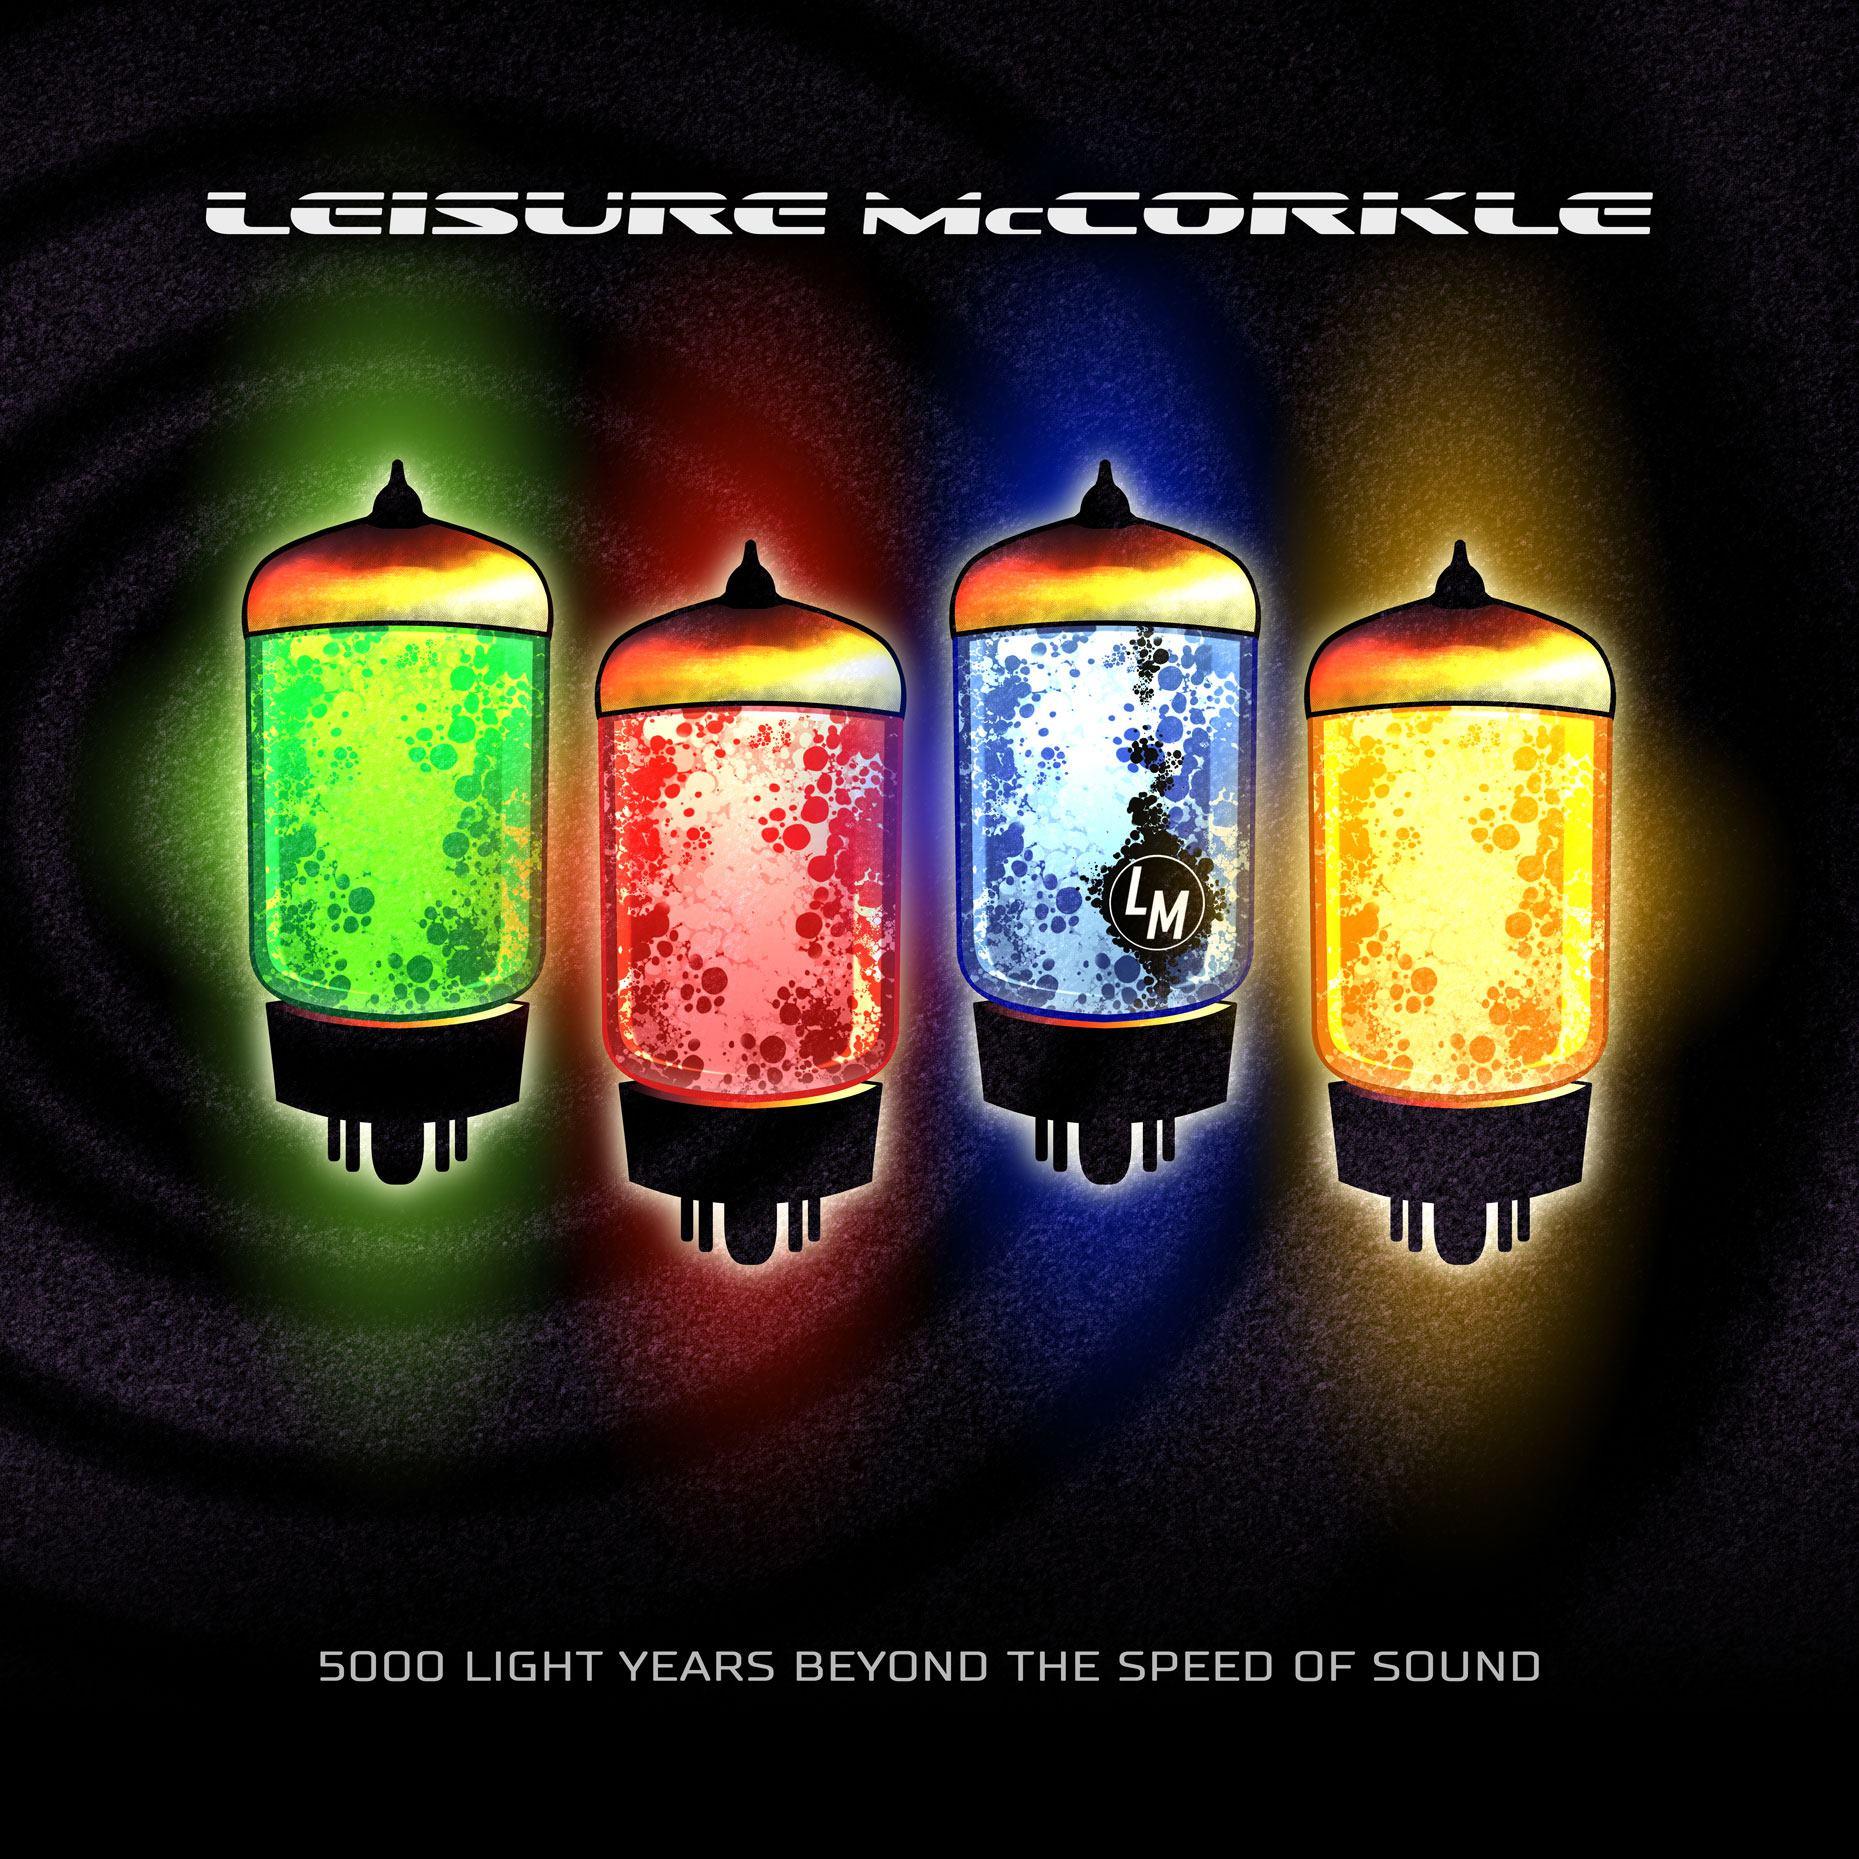 Leisure McCorkle at Mac's Speed Shop @ Restaurants & Bars